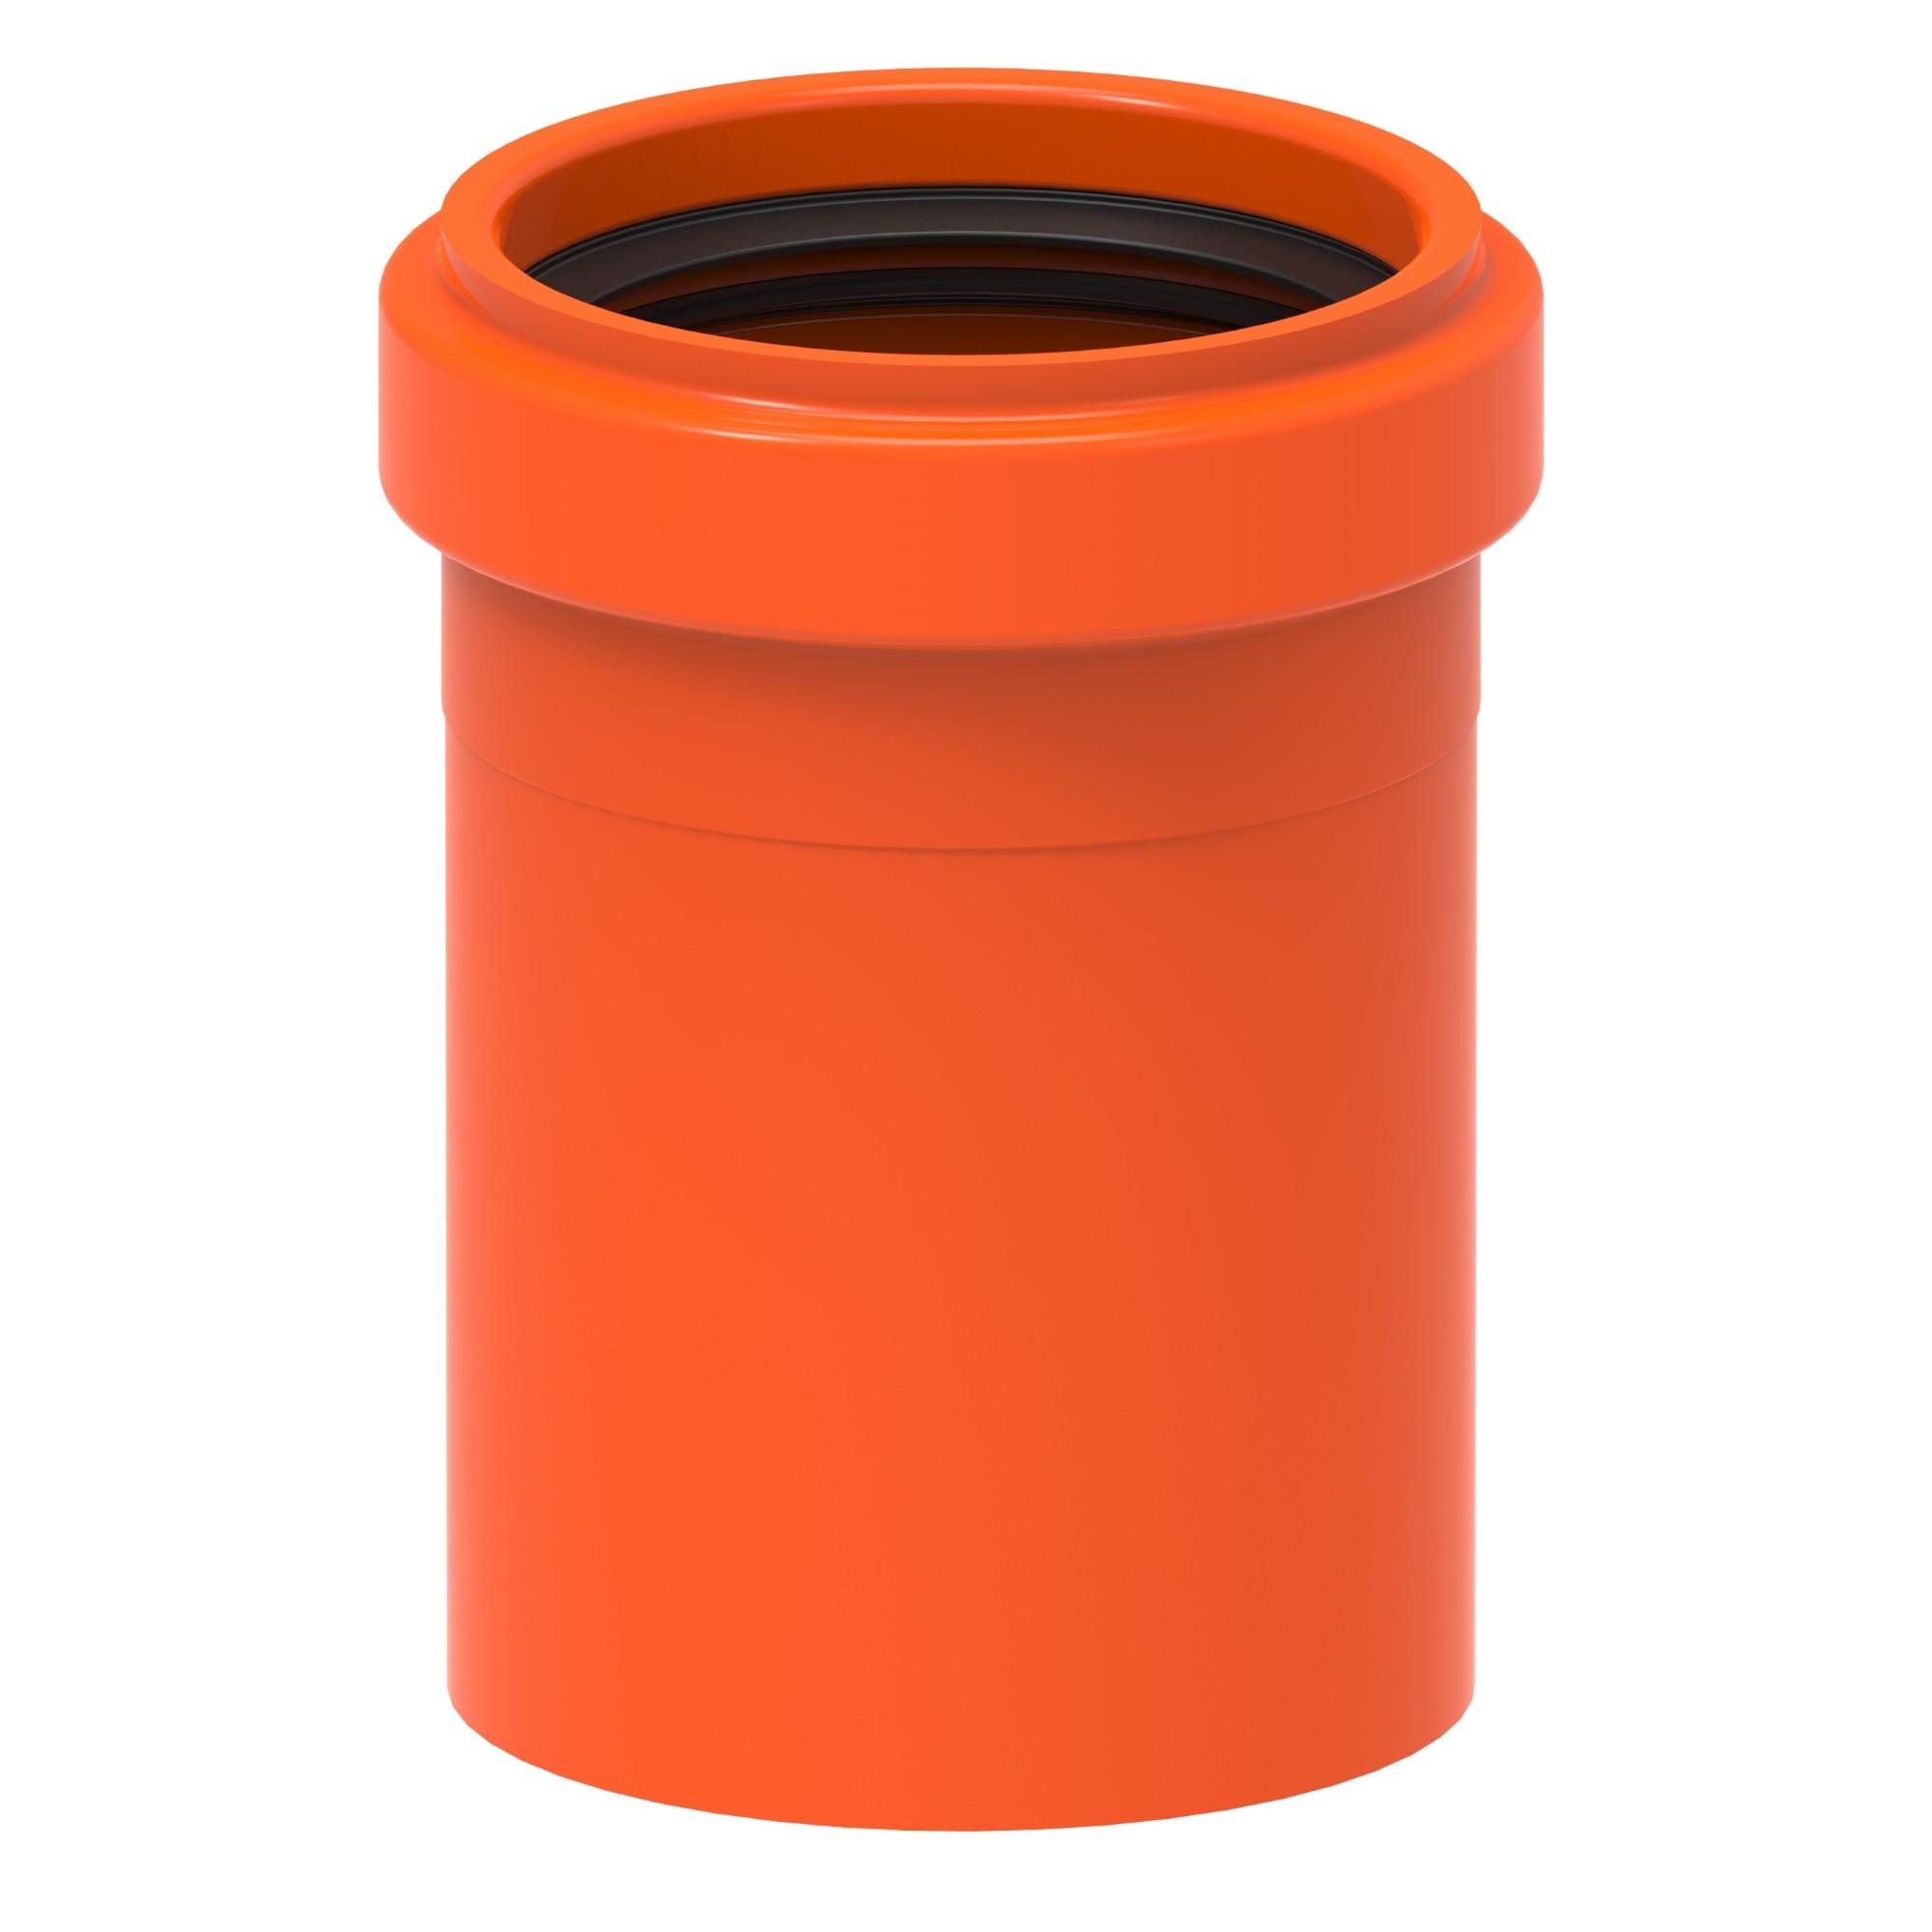 Luva Simples para Esgoto PVC Laranja 75 mm - Tigre